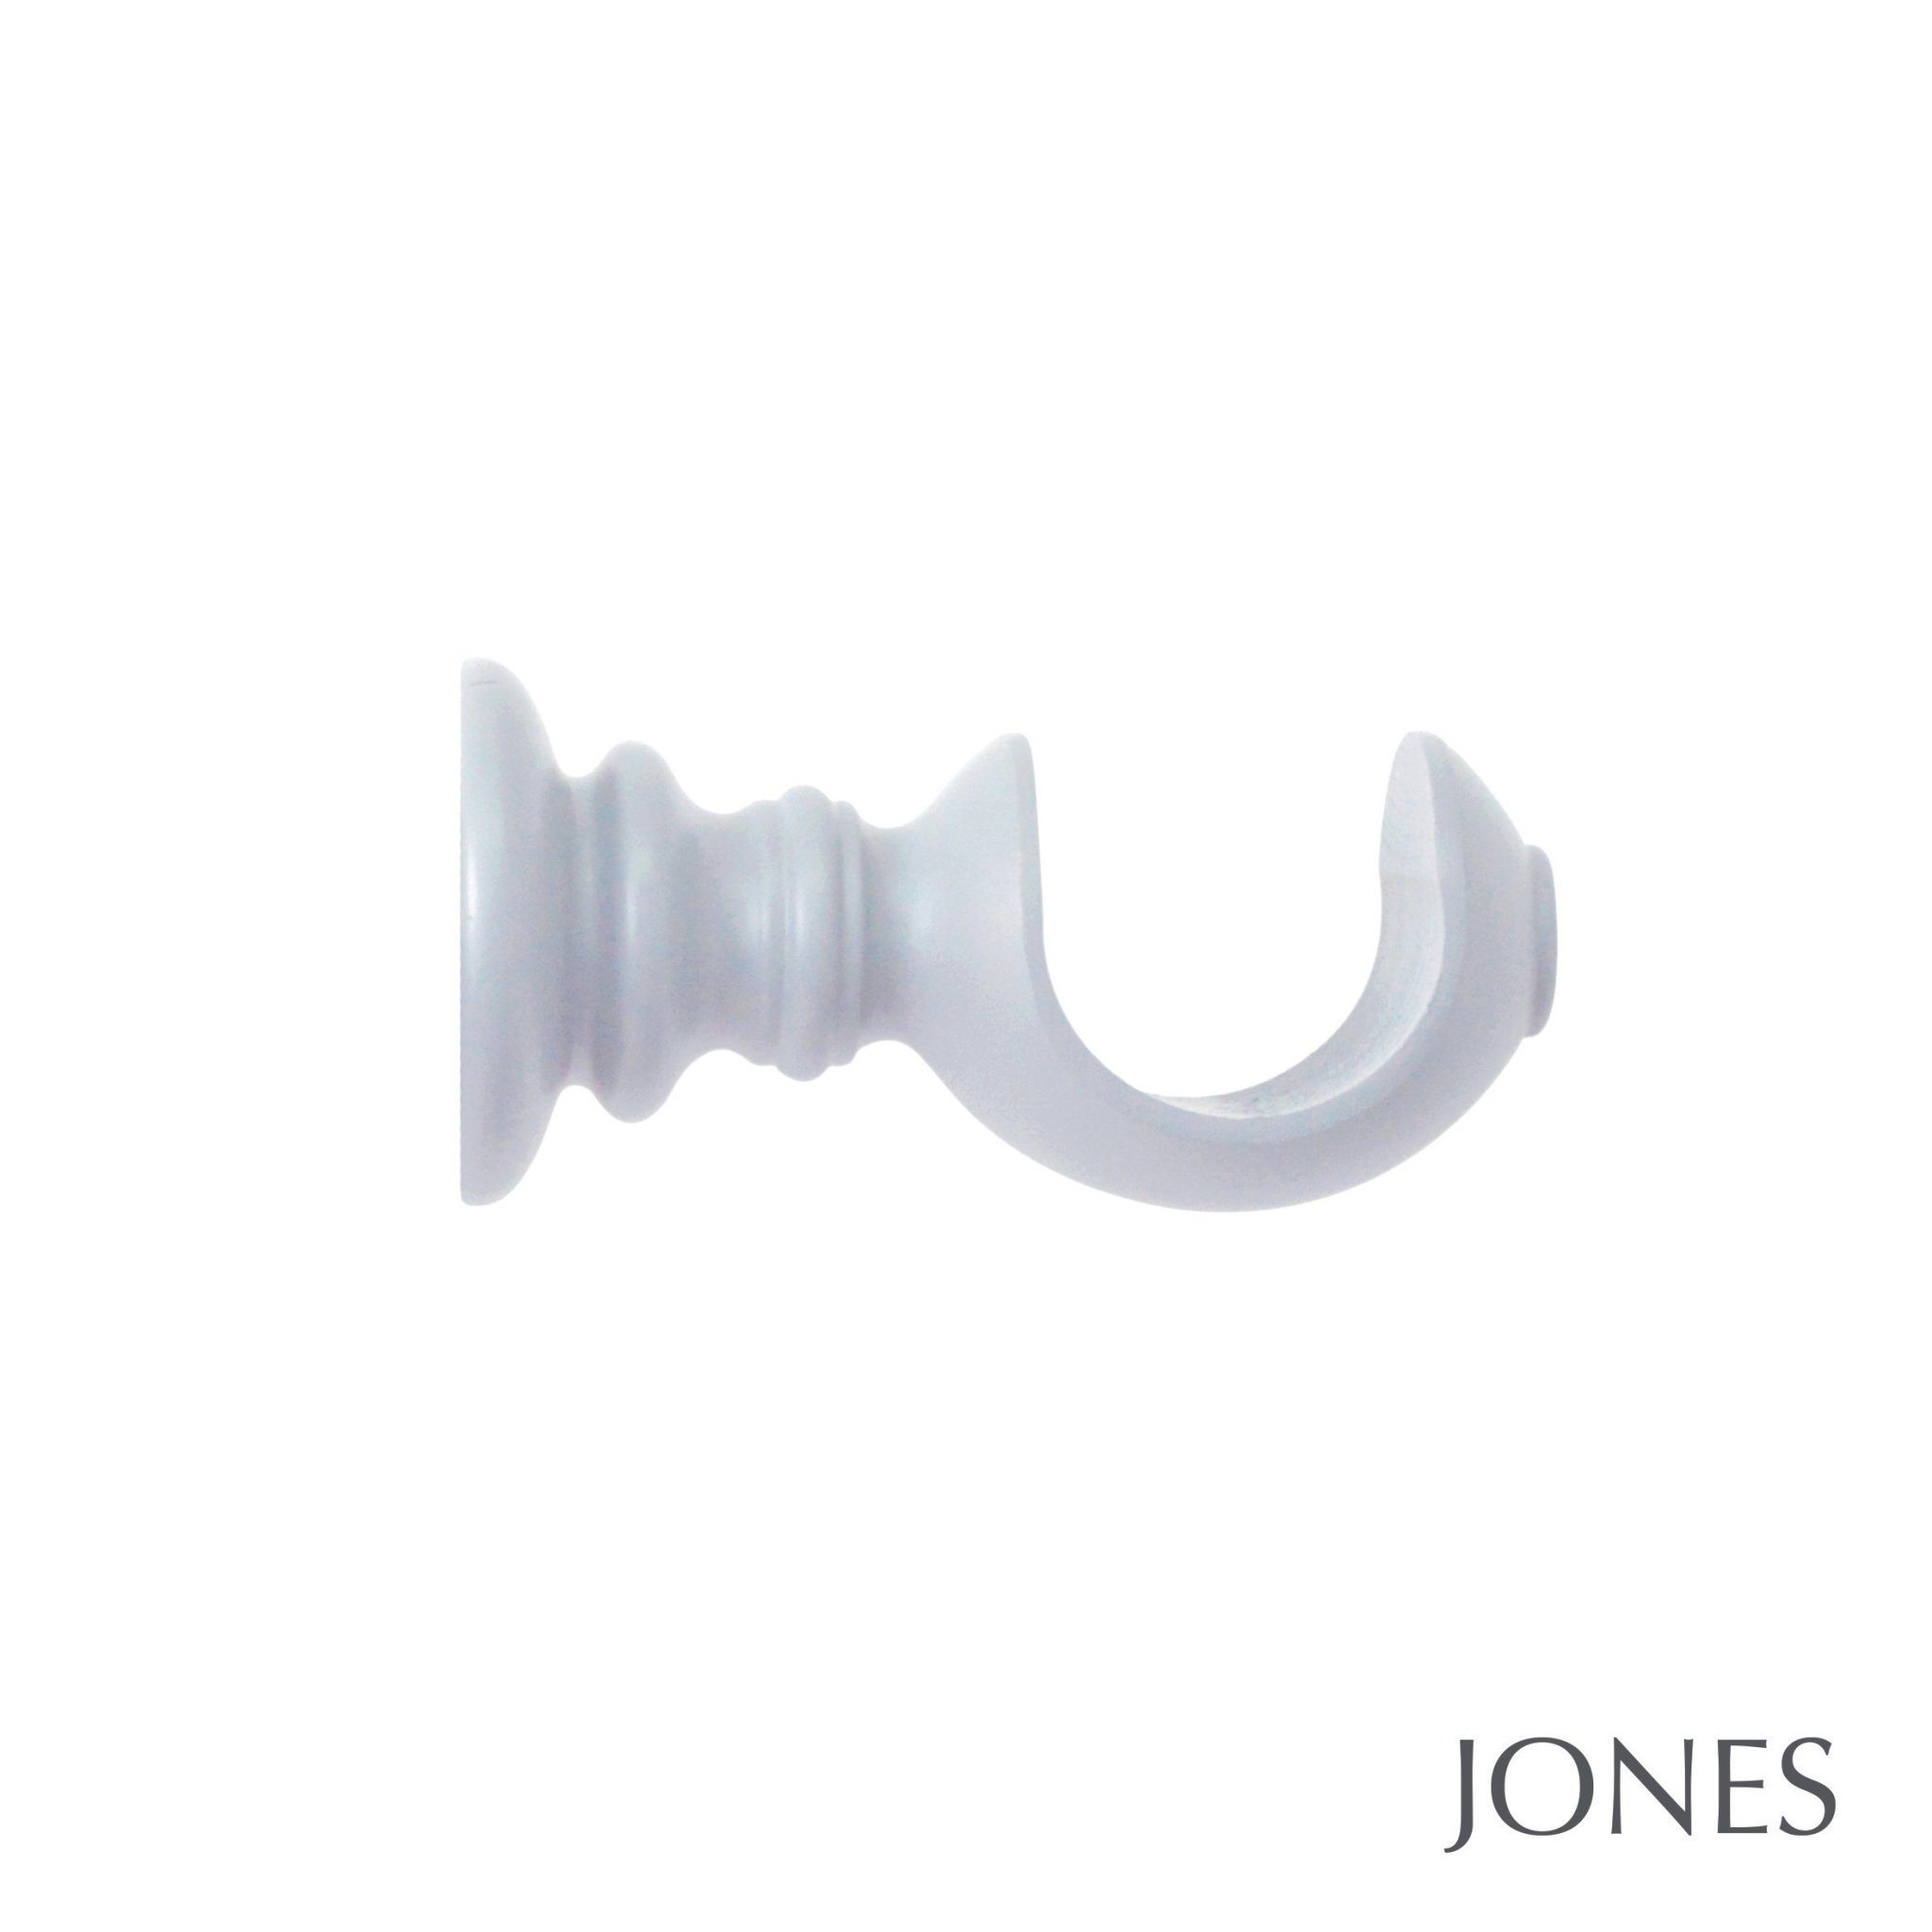 Jones Estate Handcrafted 50mm Brackets